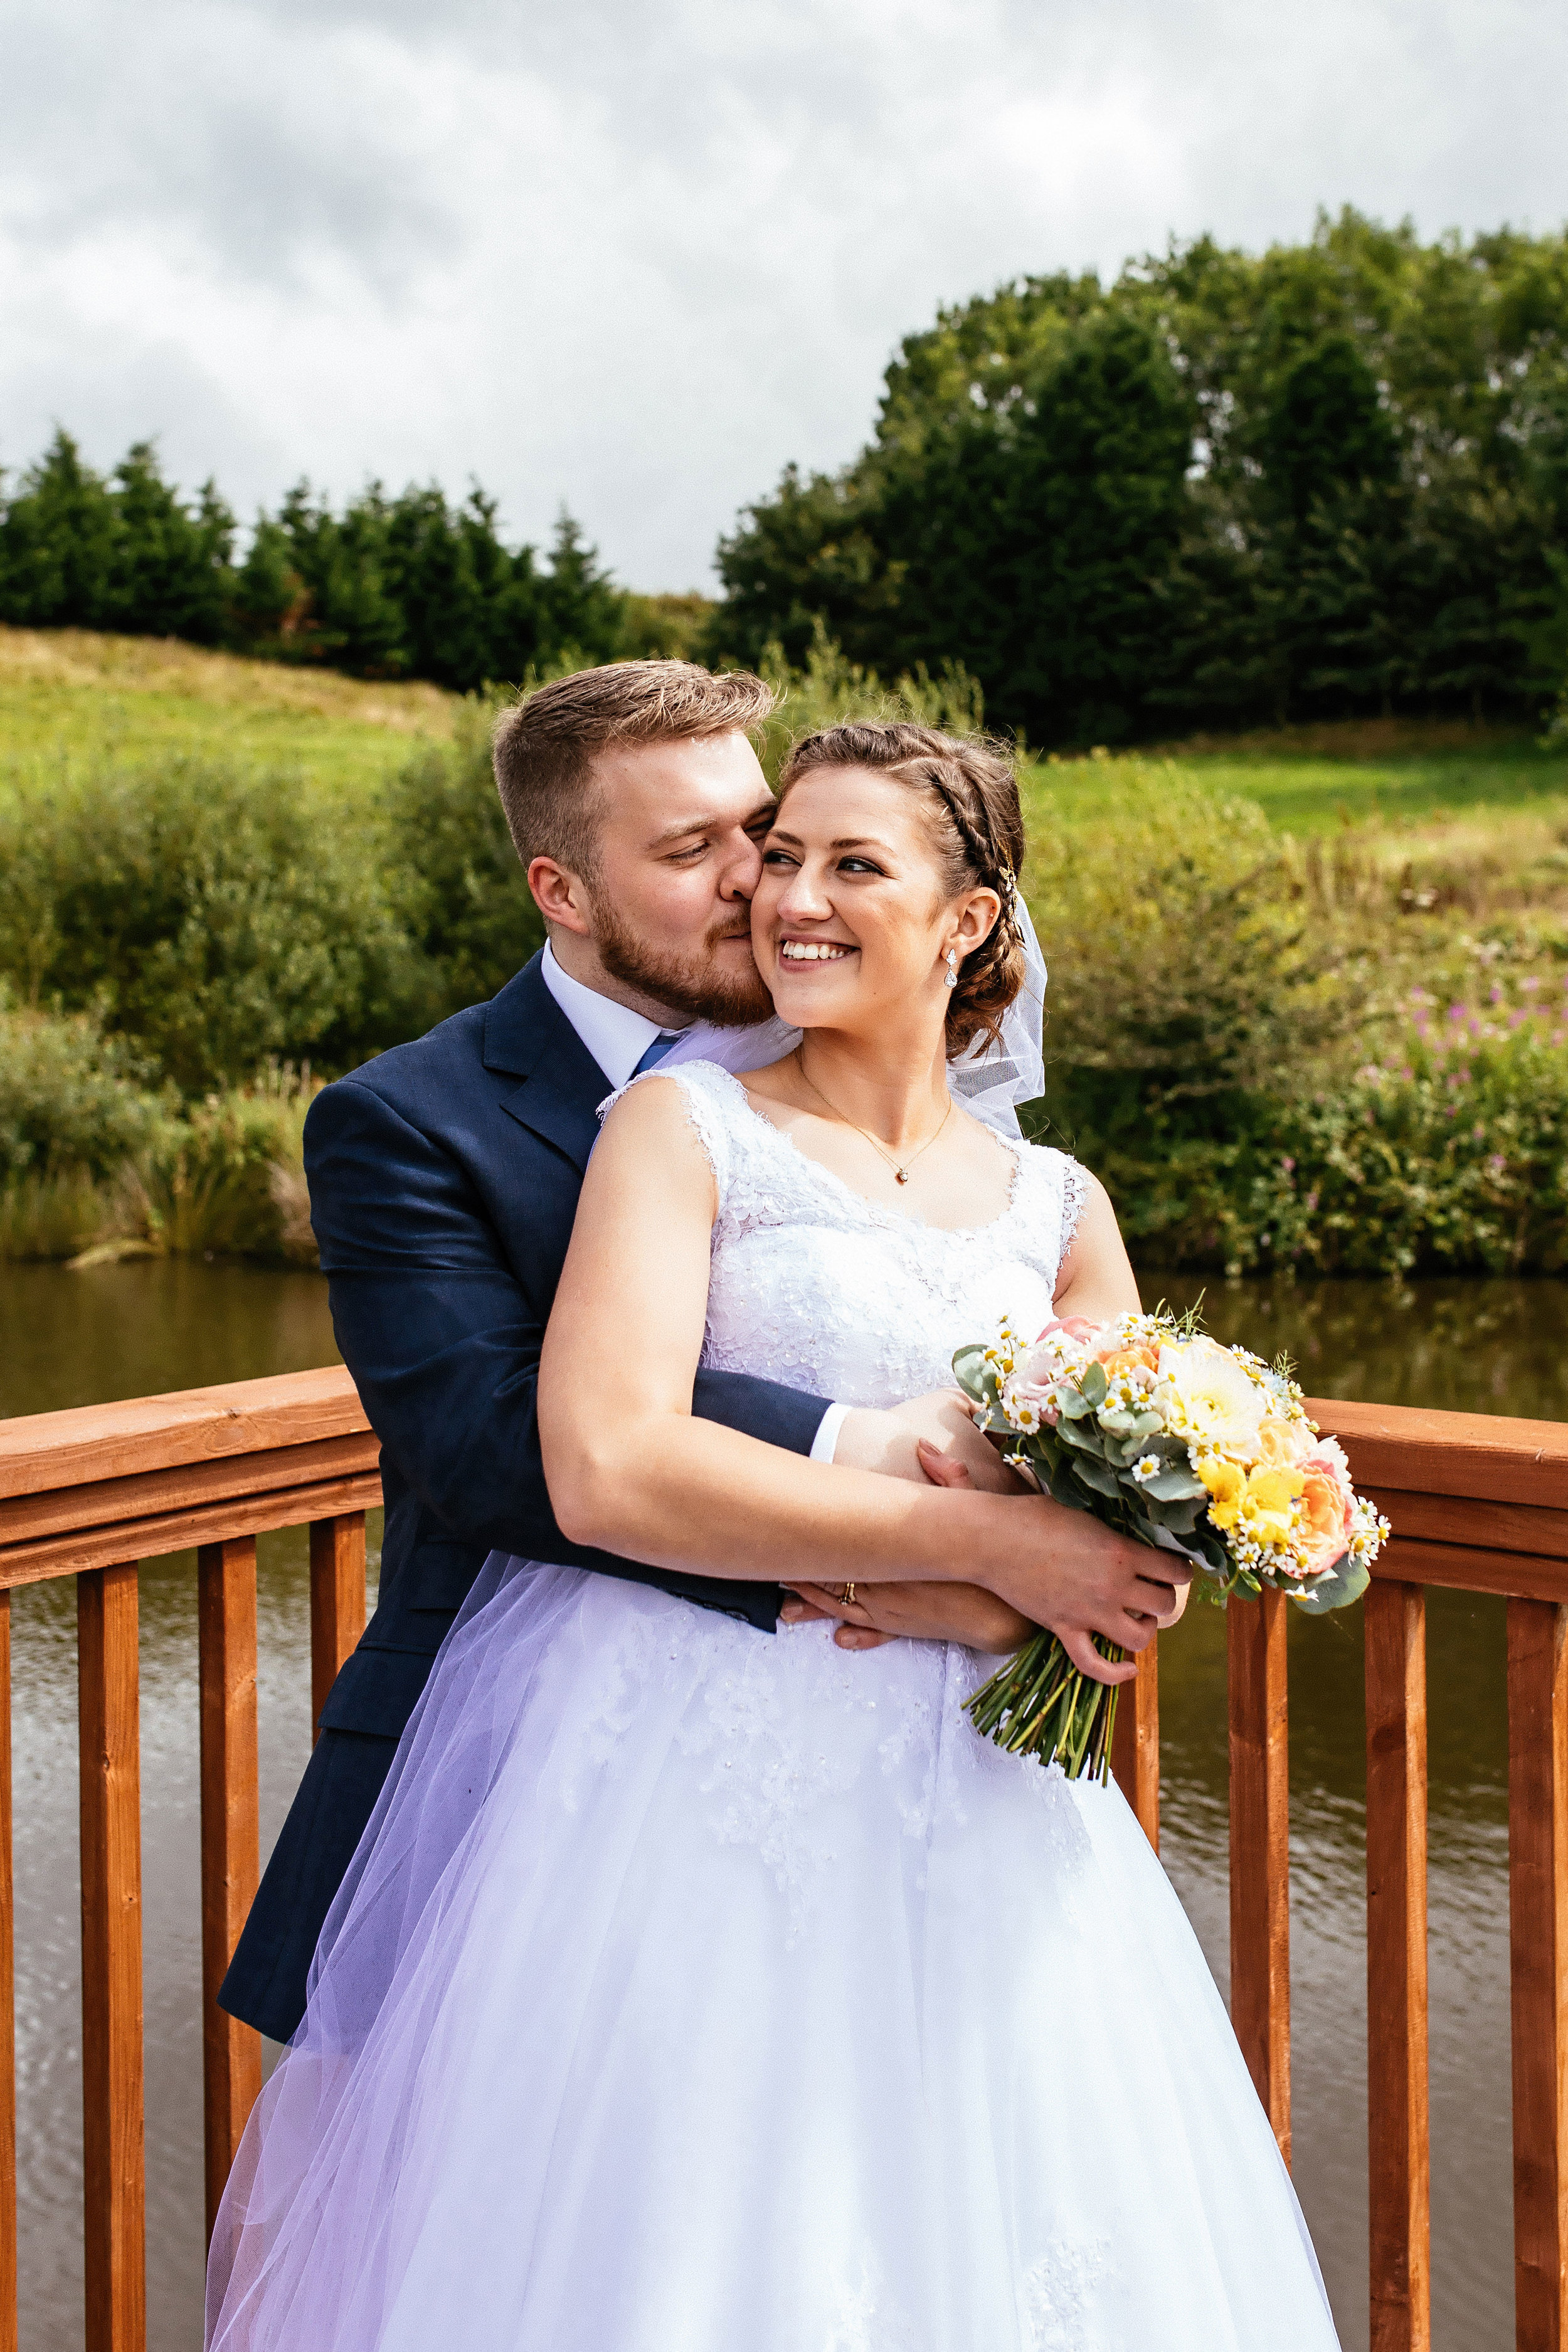 Kathryn-and-Mike-Wedding-Highlights-62.jpg